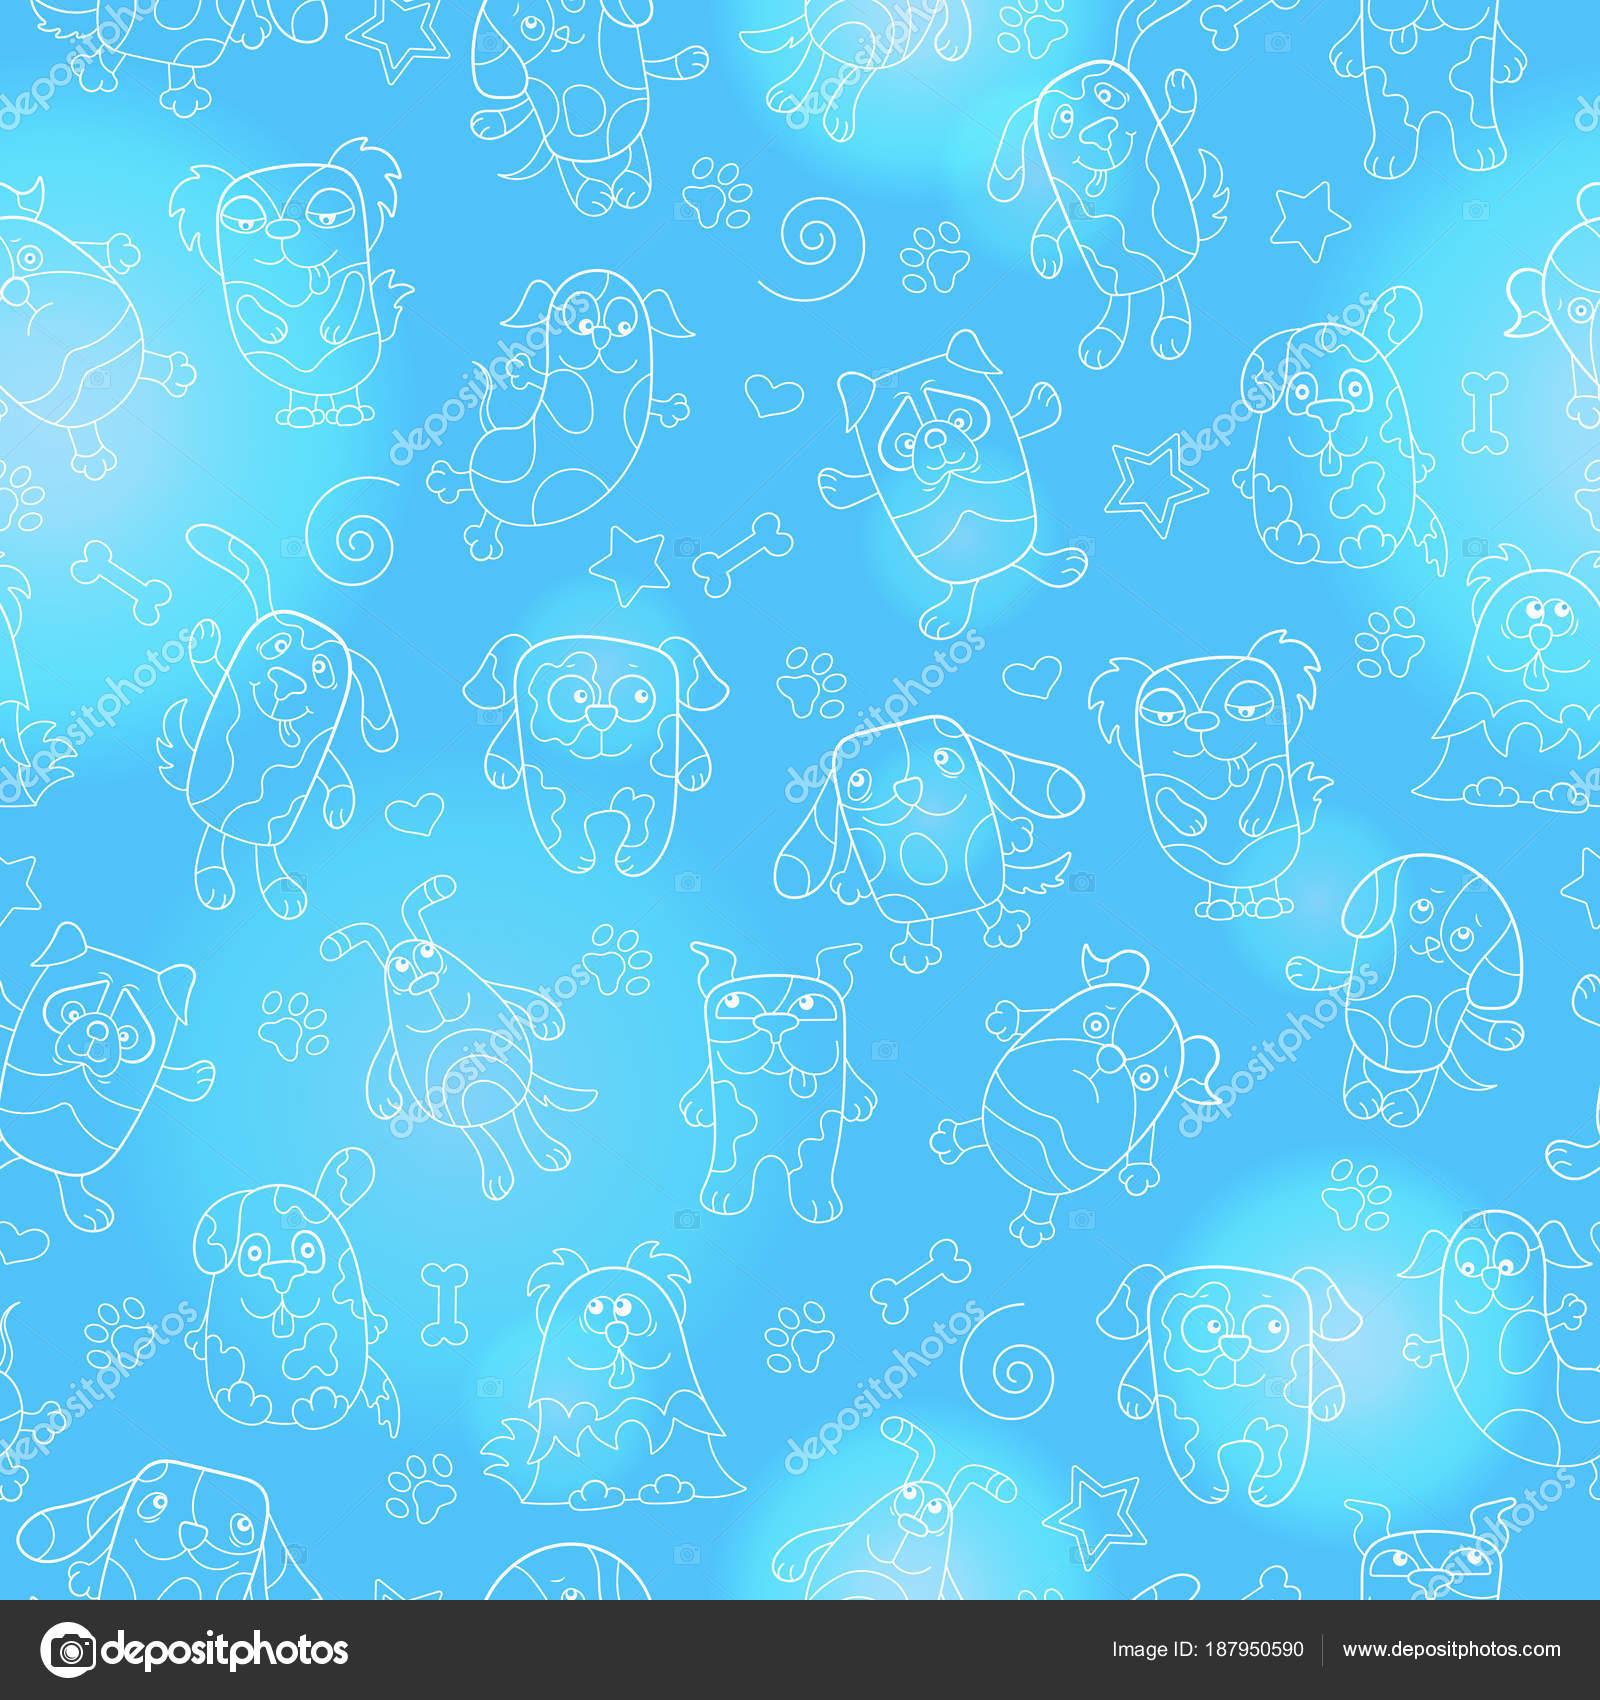 Vzor Bezesve S Obrysy Obrazku Kreslenych Psu Lehke Osnovy Na Modrem